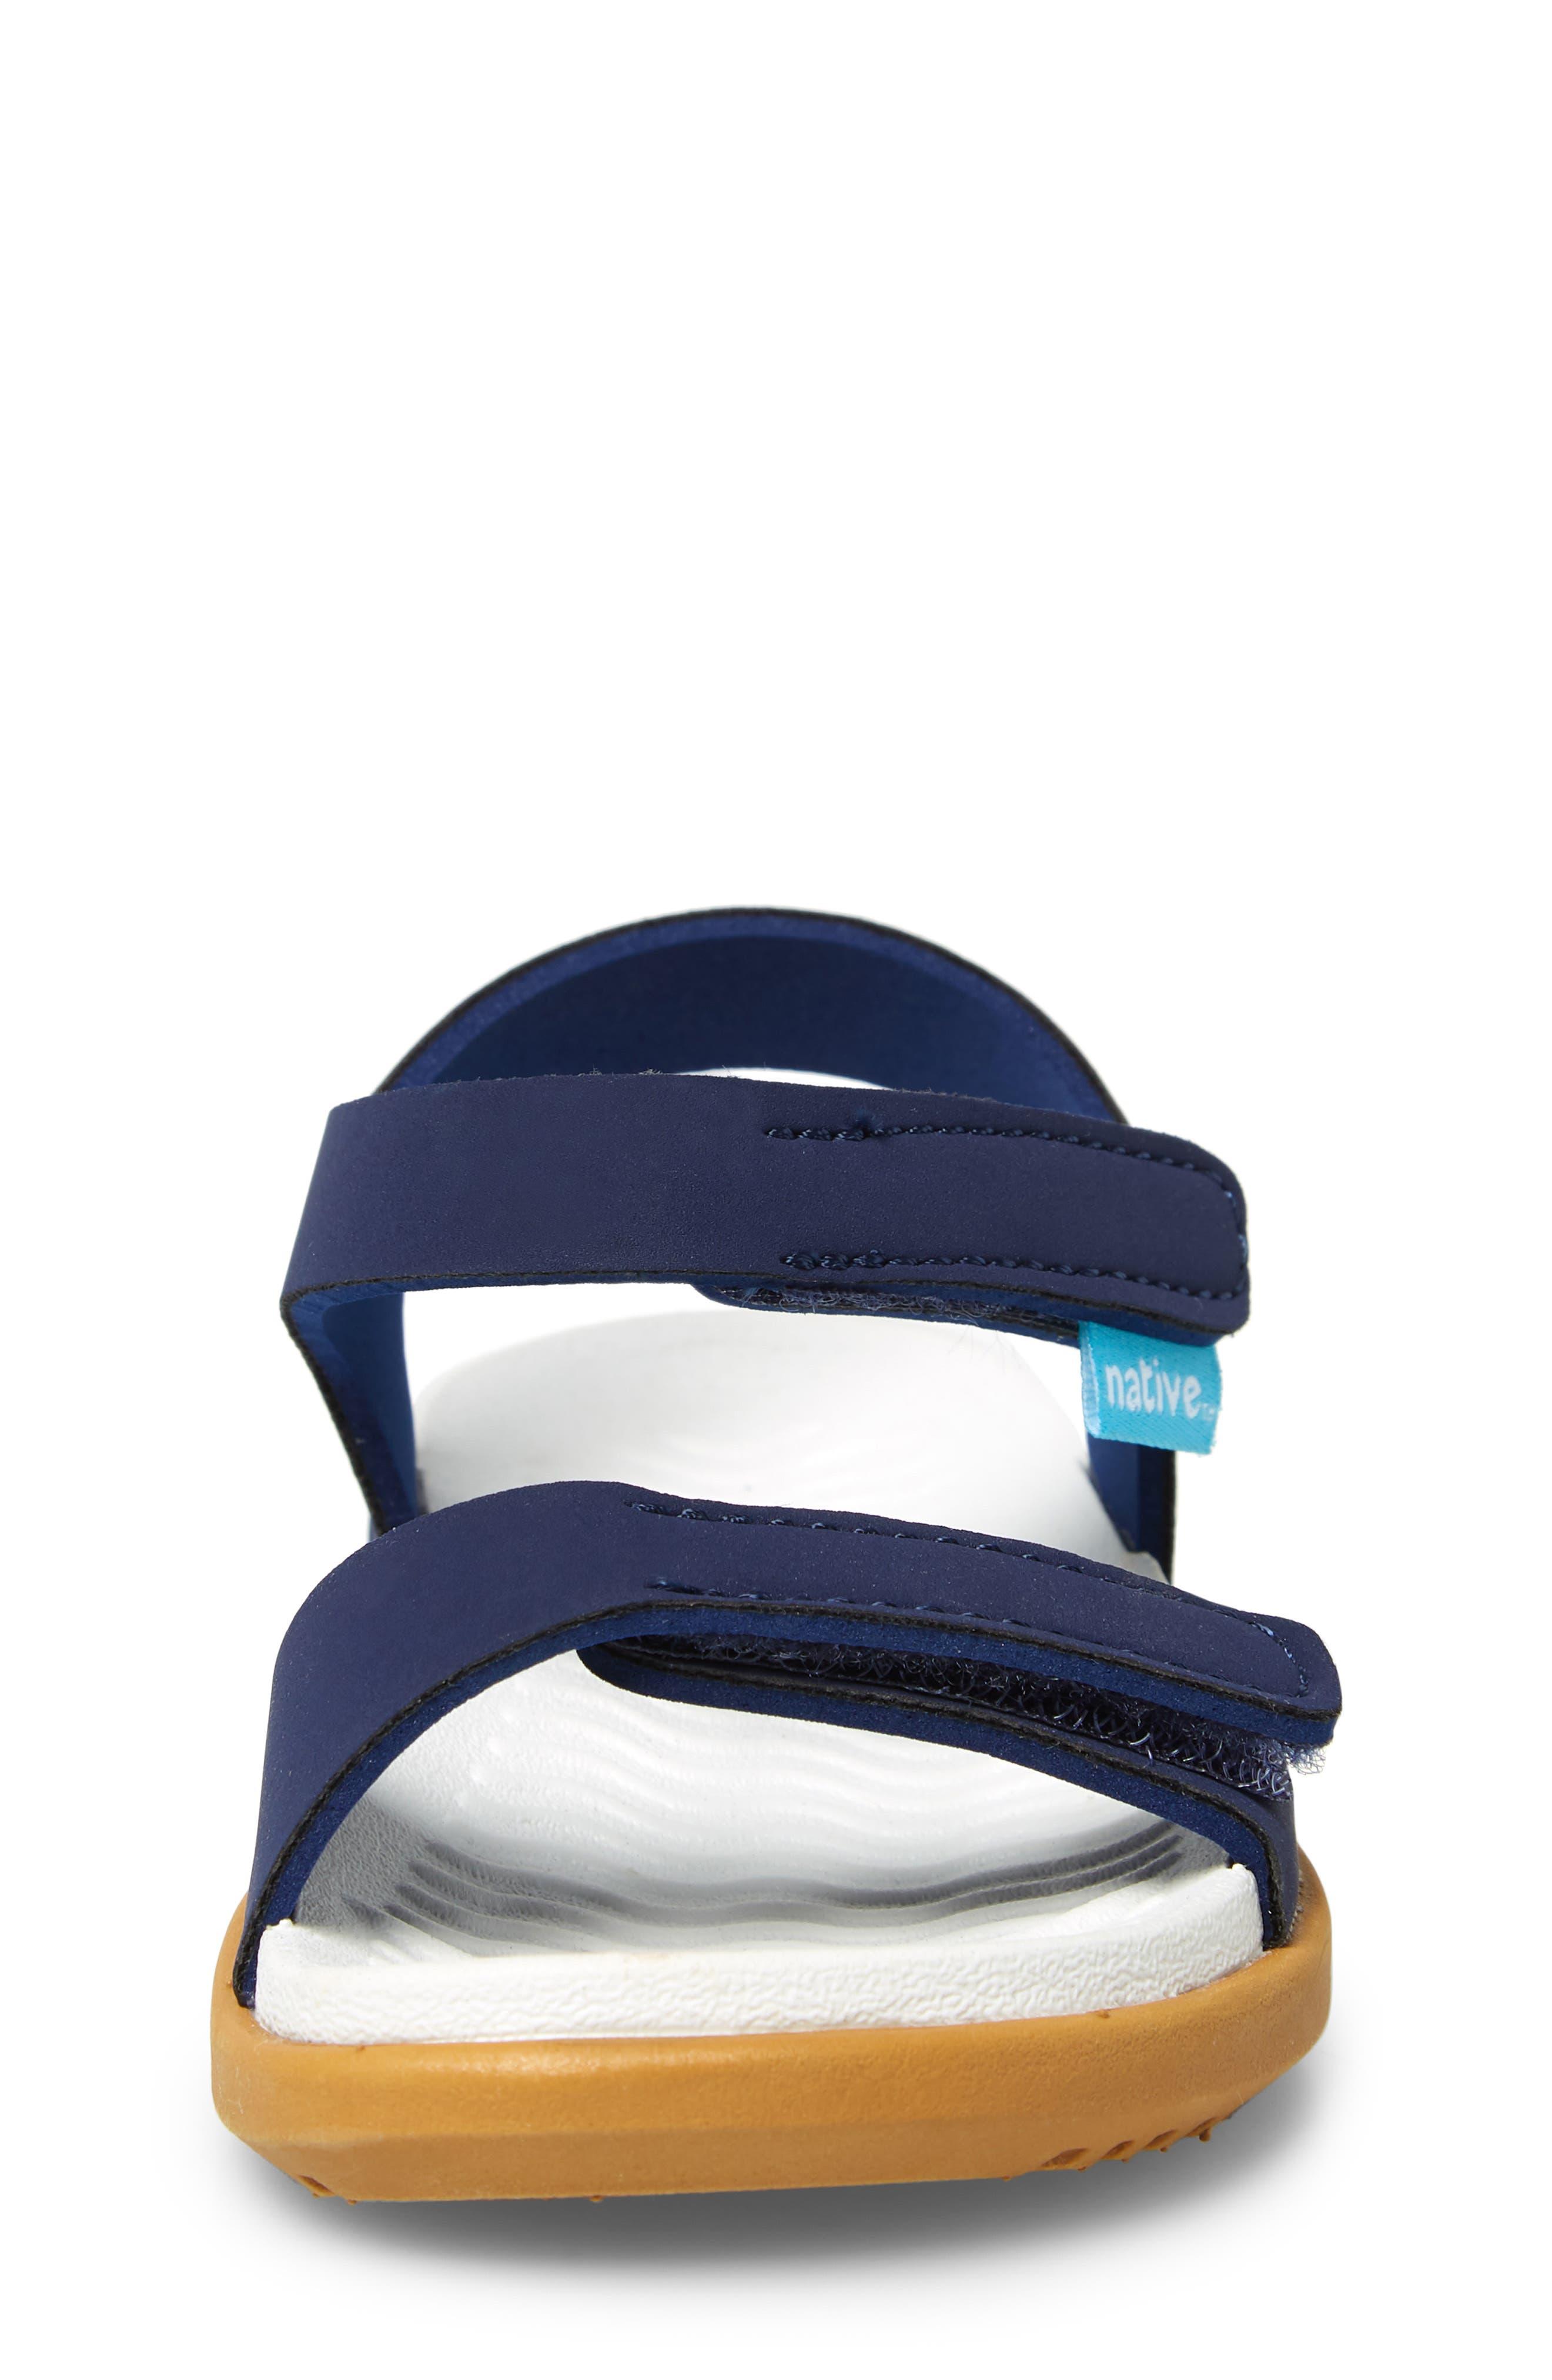 ,                             Charley Child Waterproof Flat Vegan Sandal,                             Alternate thumbnail 4, color,                             REGATTA BLUE/ WHITE/ BROWN